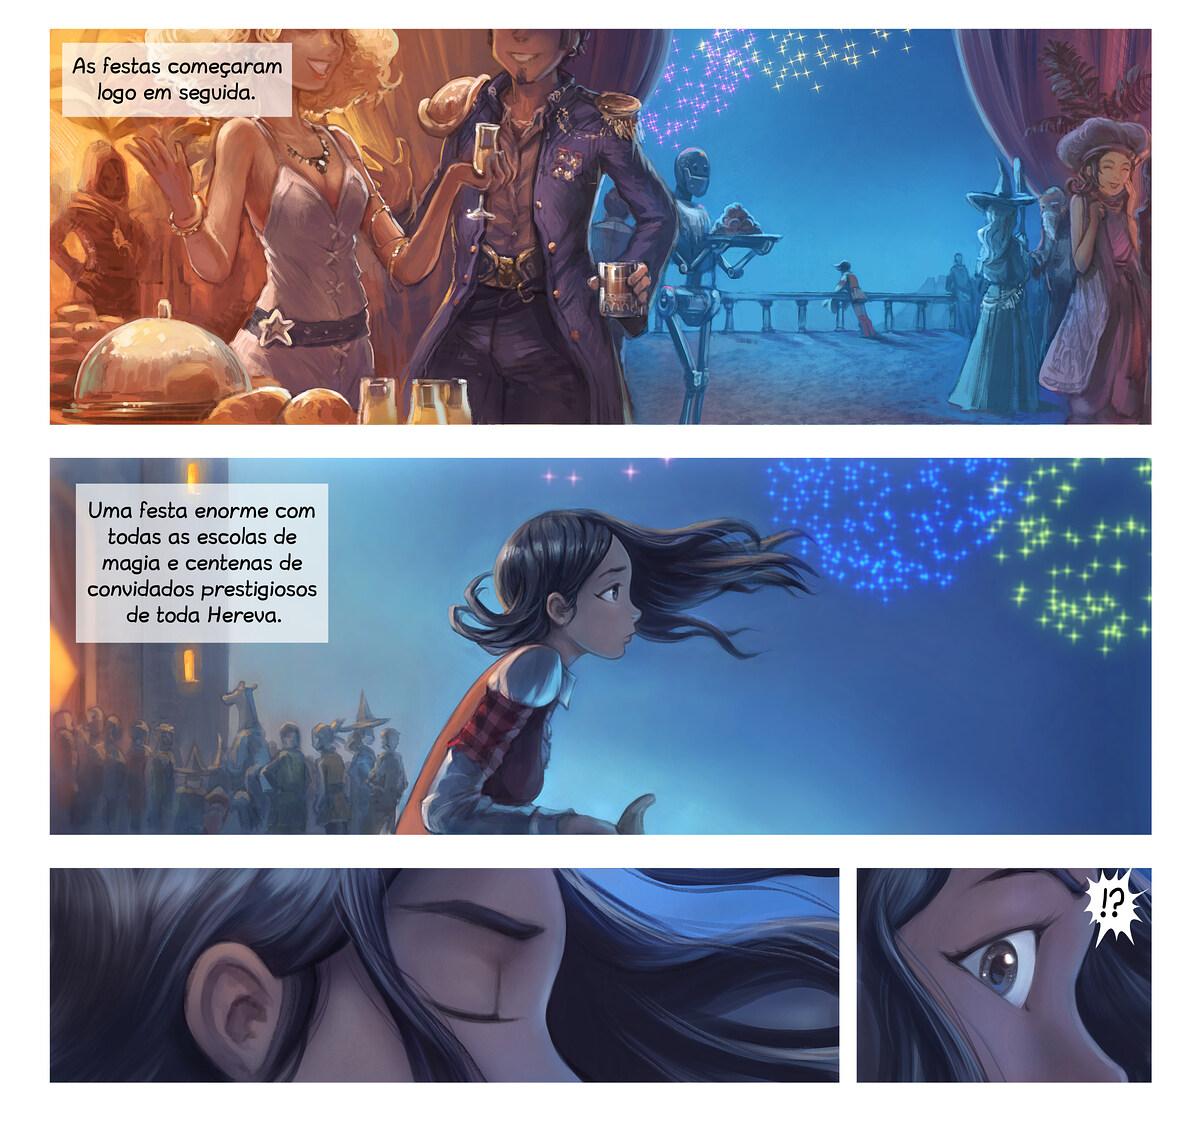 A webcomic page of Pepper&Carrot, episódio 28 [pt], página 3